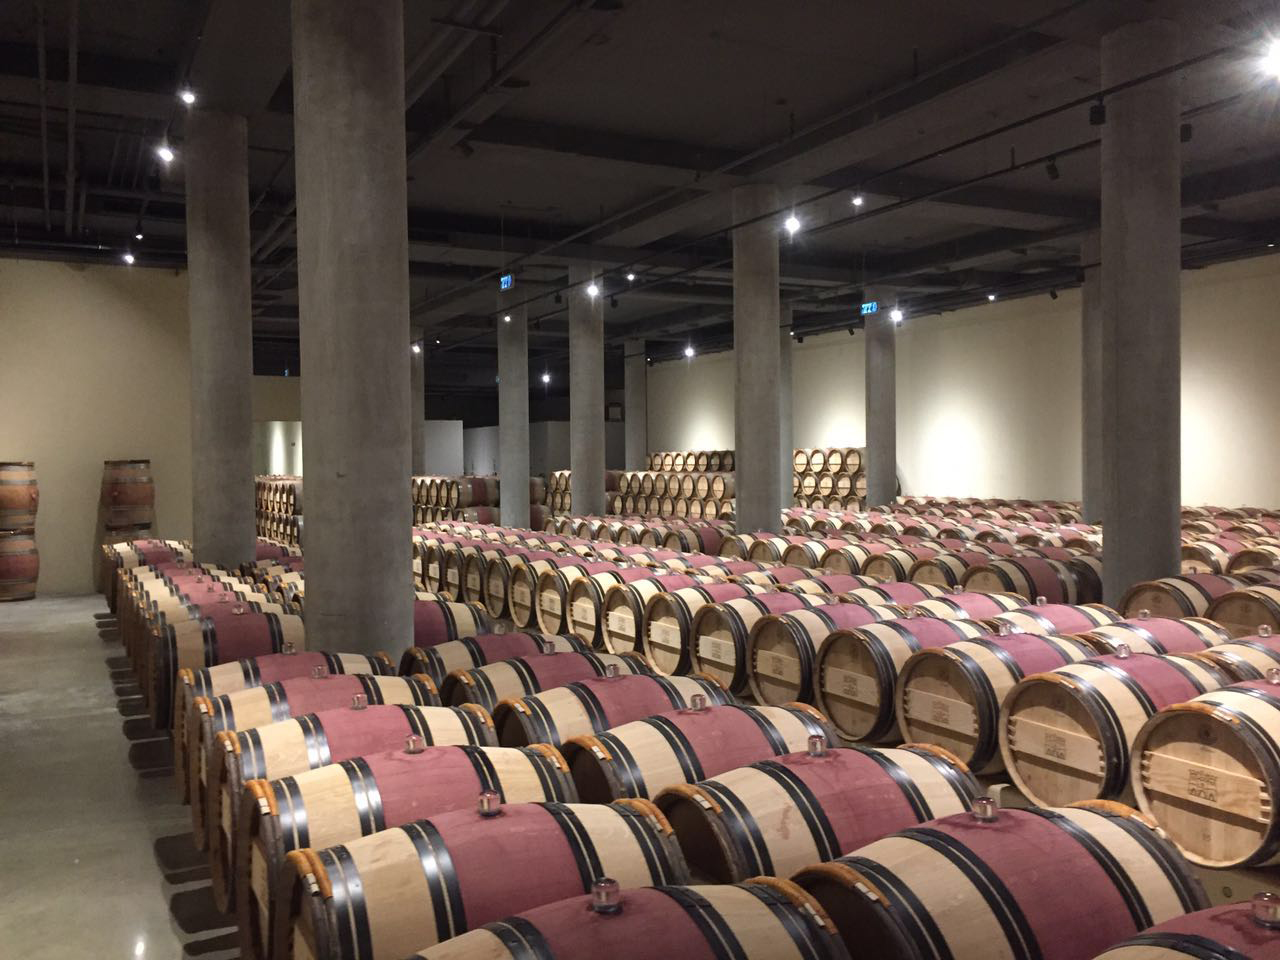 humidification in wine barrel room